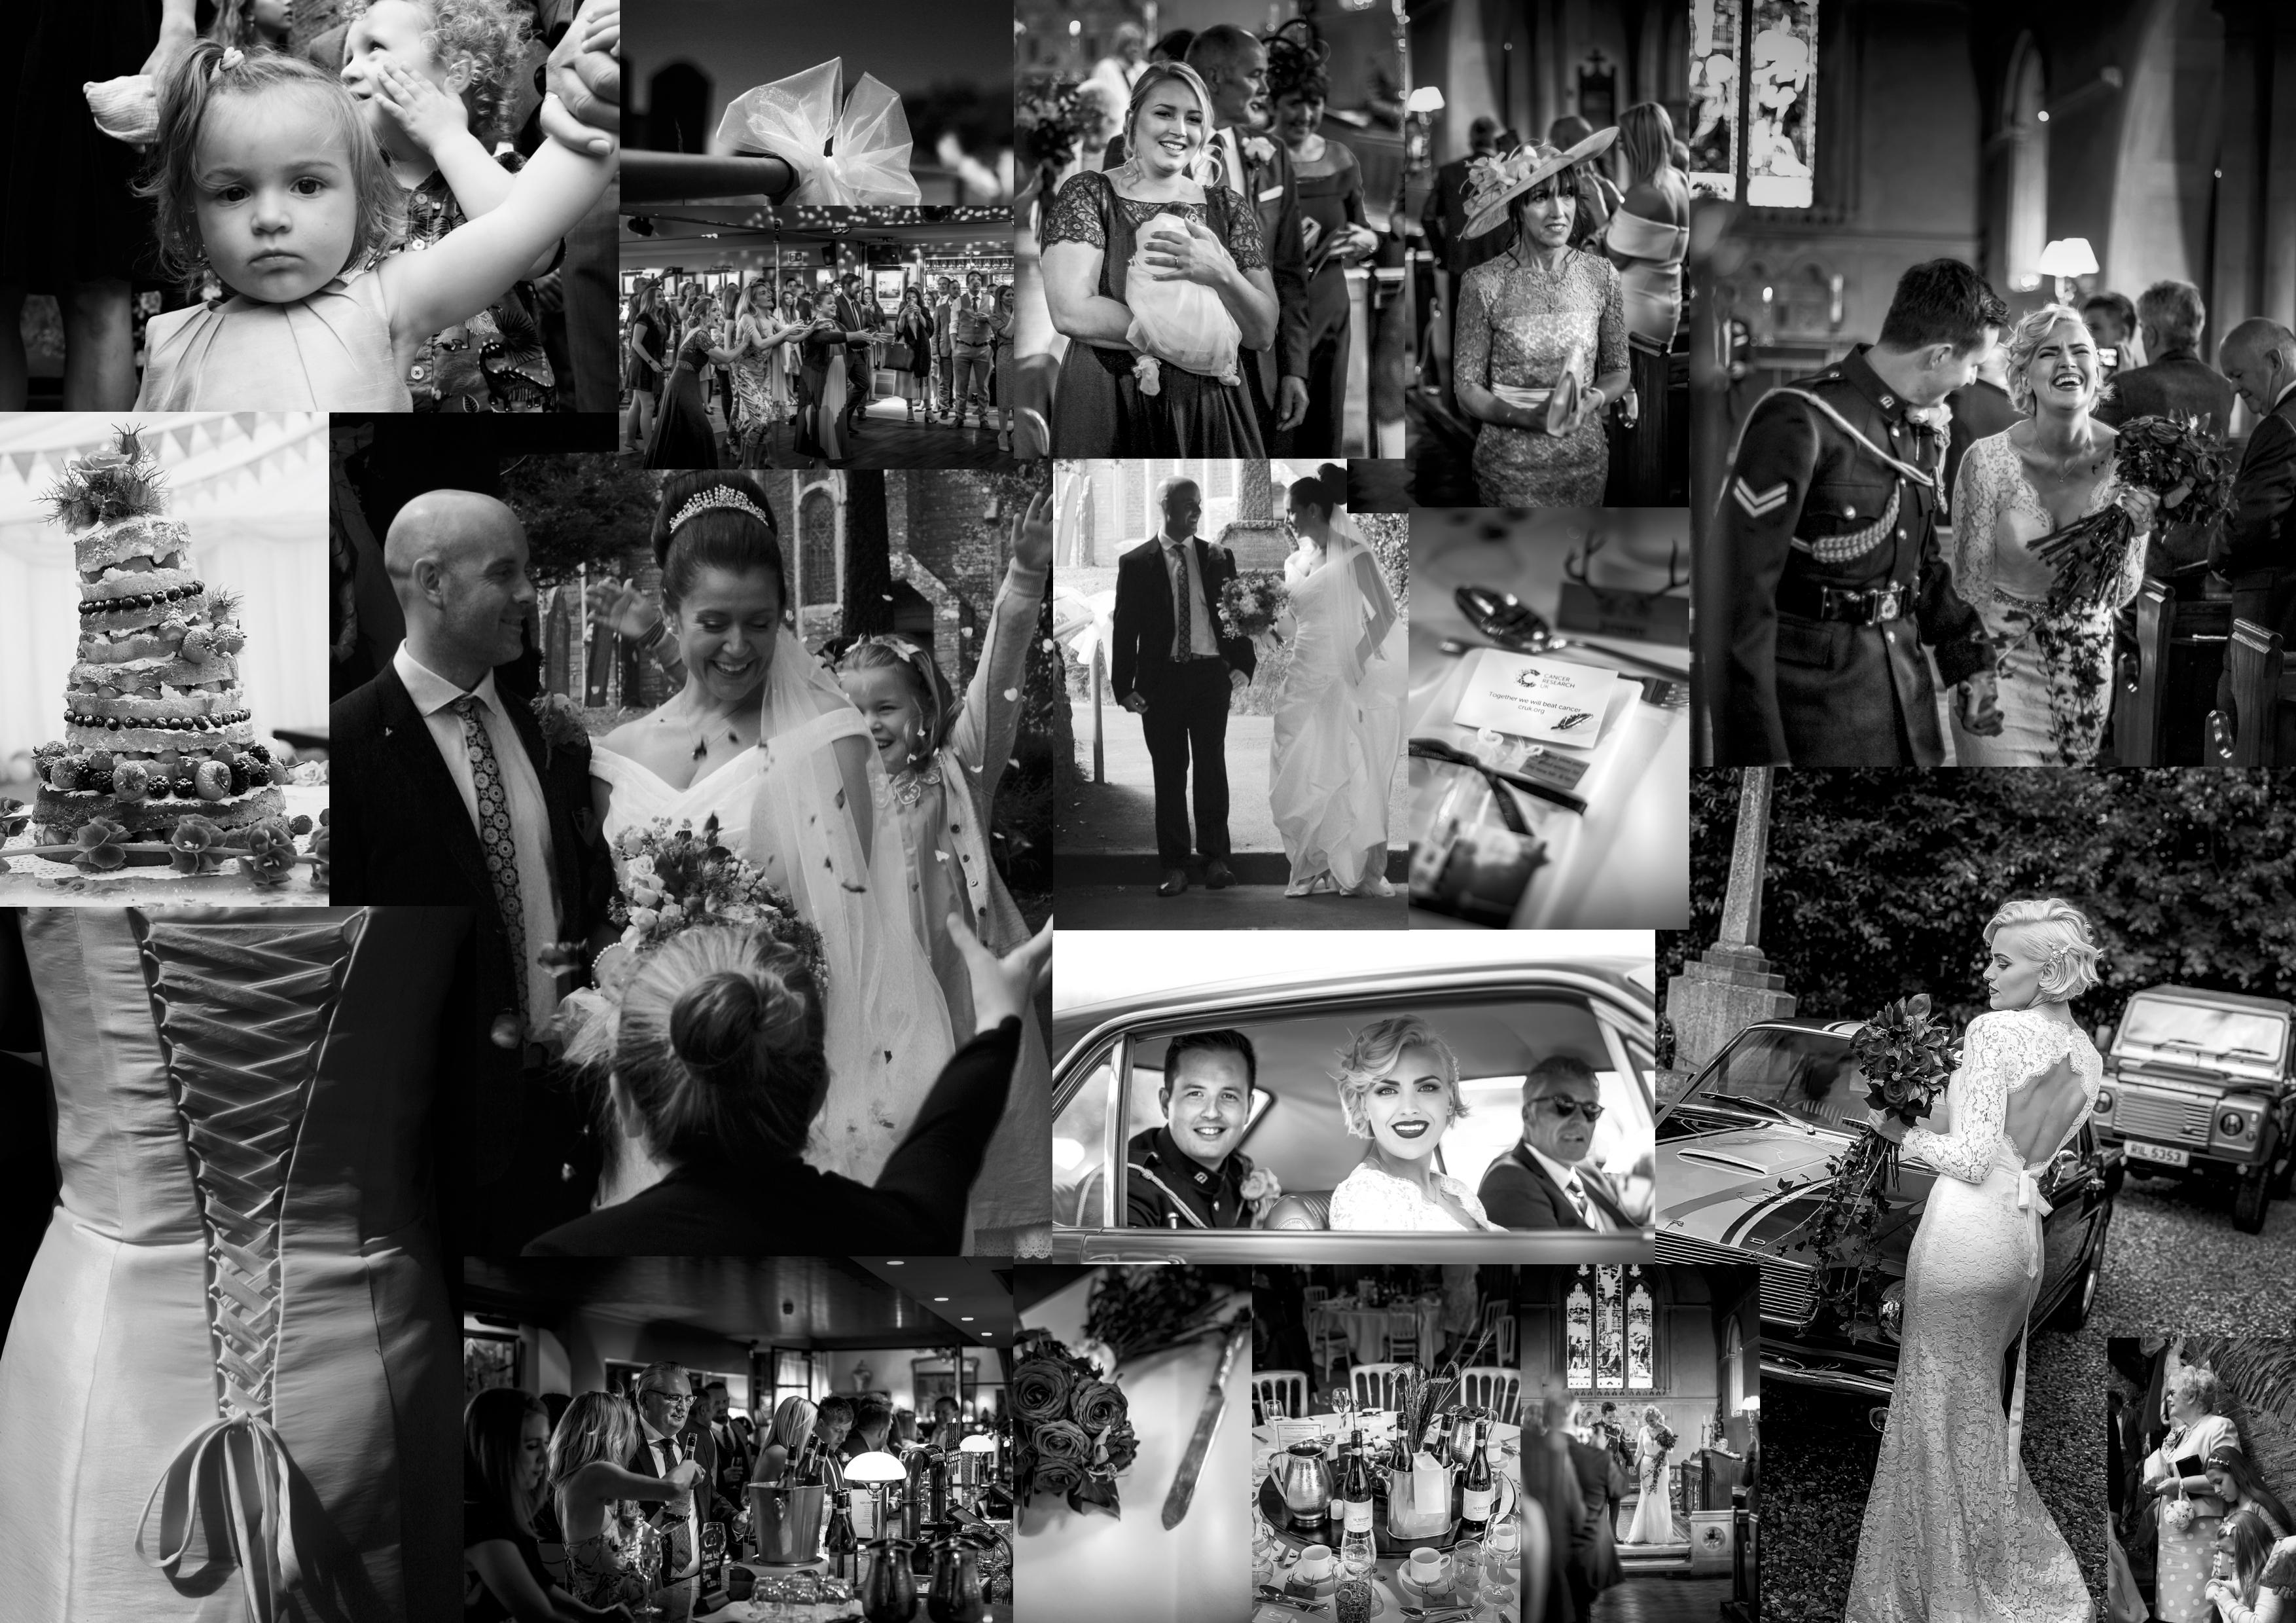 Second lens Weddings